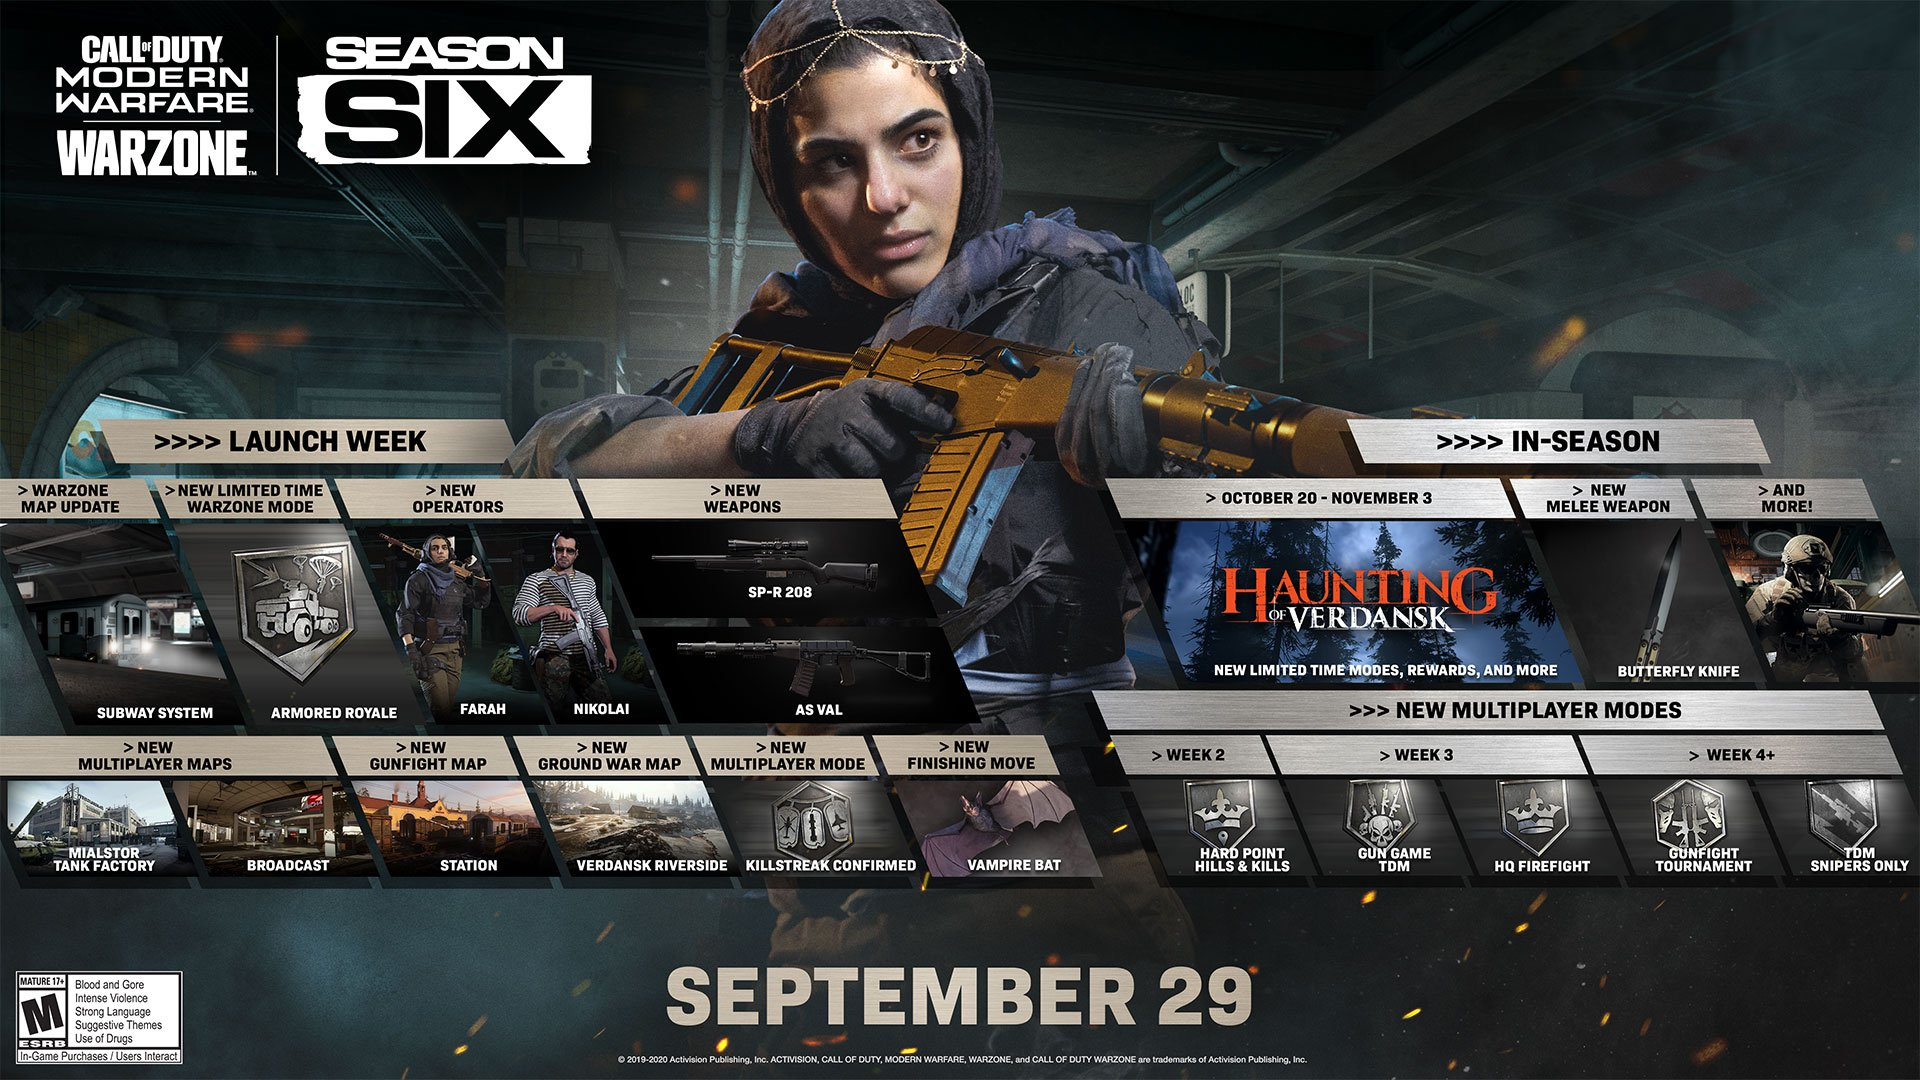 Call of Duty season 6 Call of Duty modern Warfare call of duty Warzone